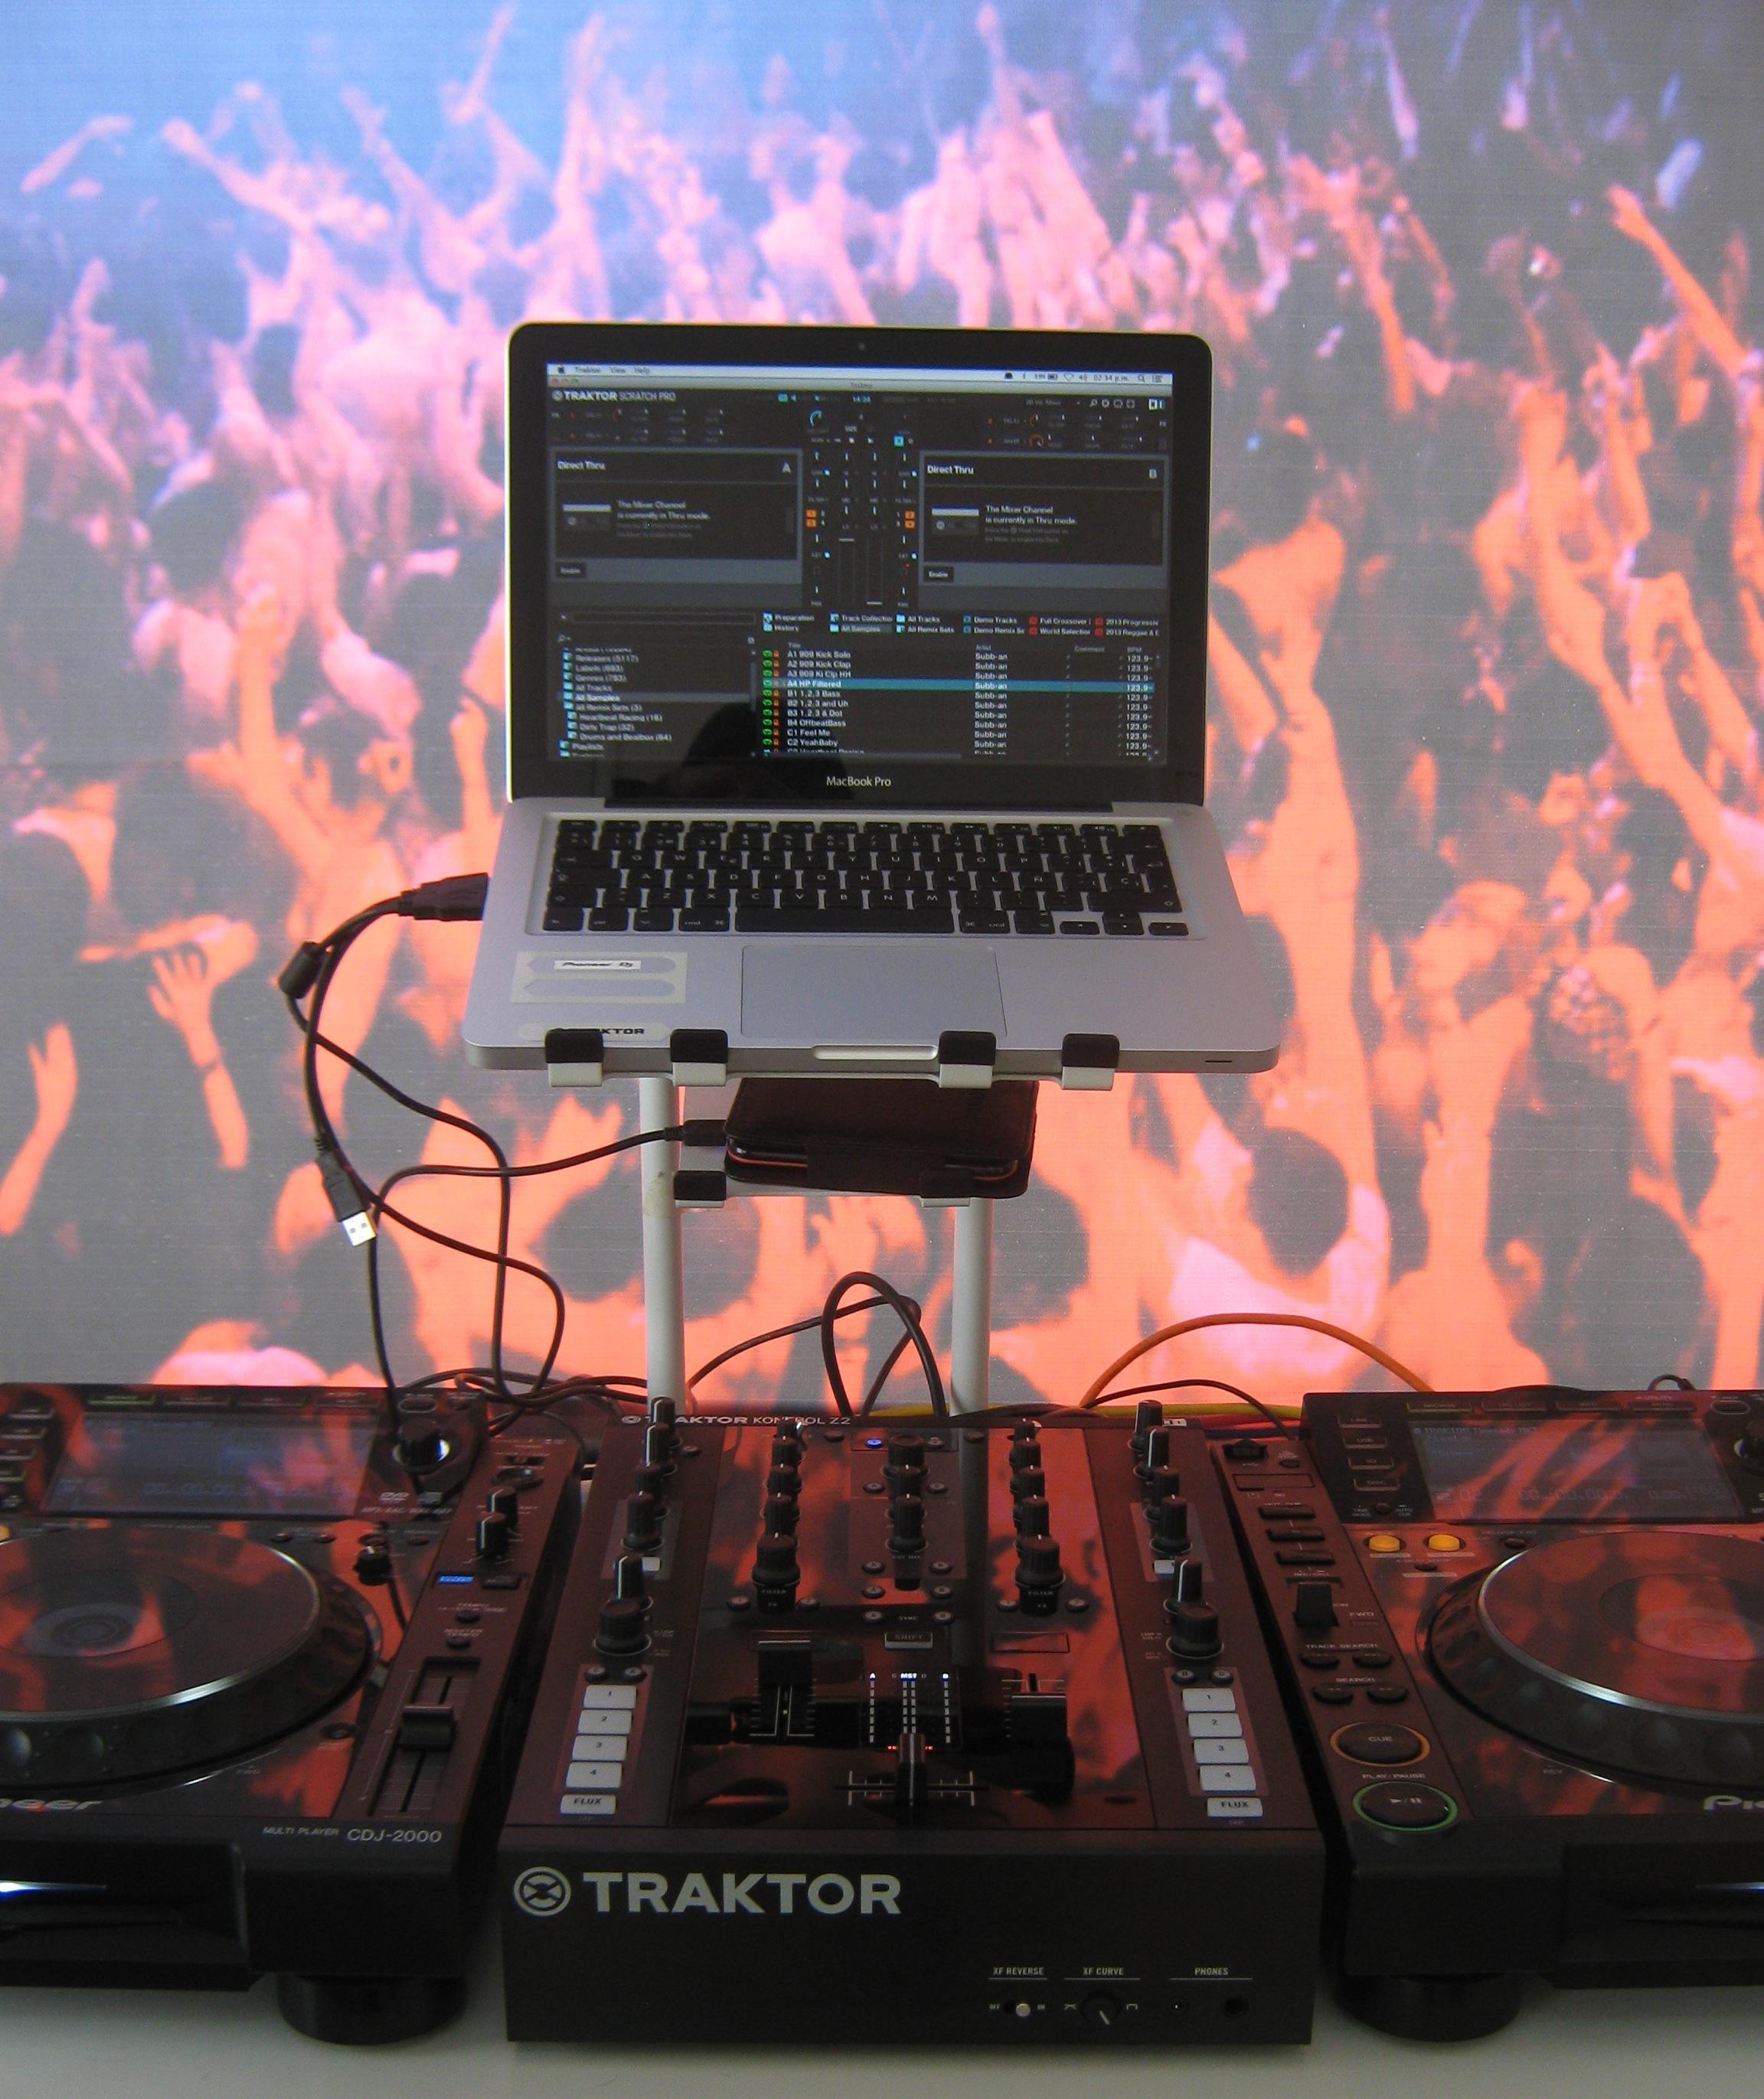 CDJ PIONEER GRATUIT 2000 DJ TÉLÉCHARGER